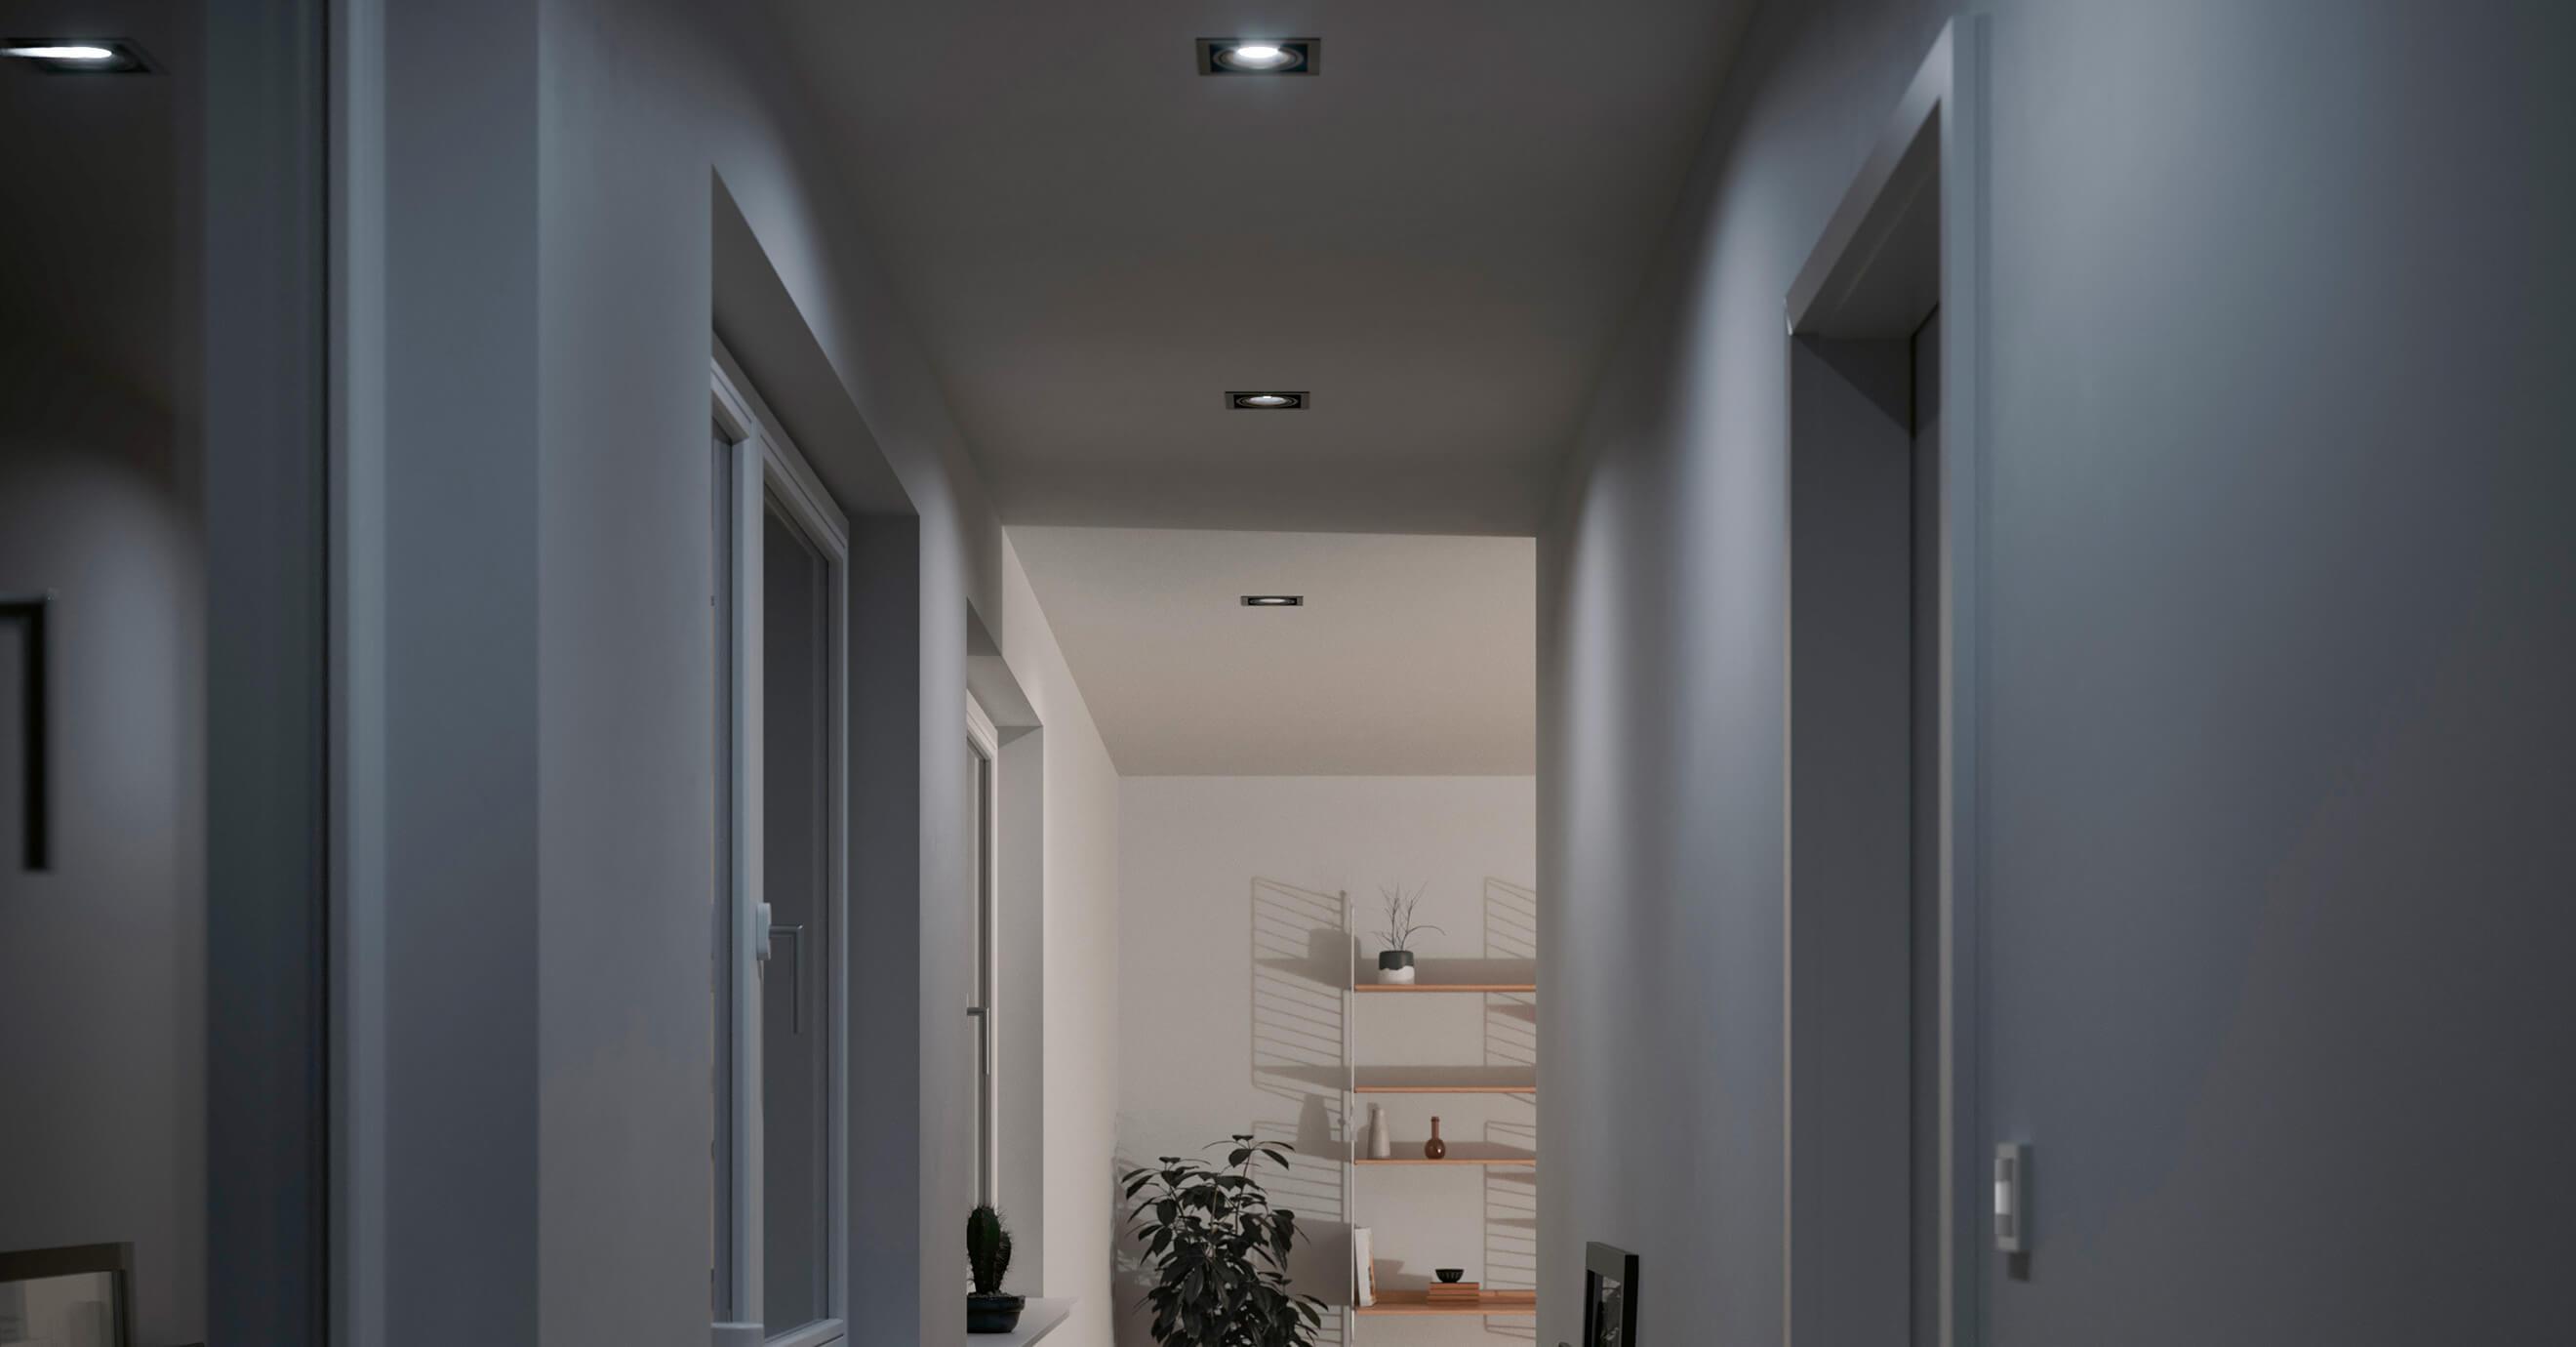 Doman energie-efficiënter wonen door lichtbesparing